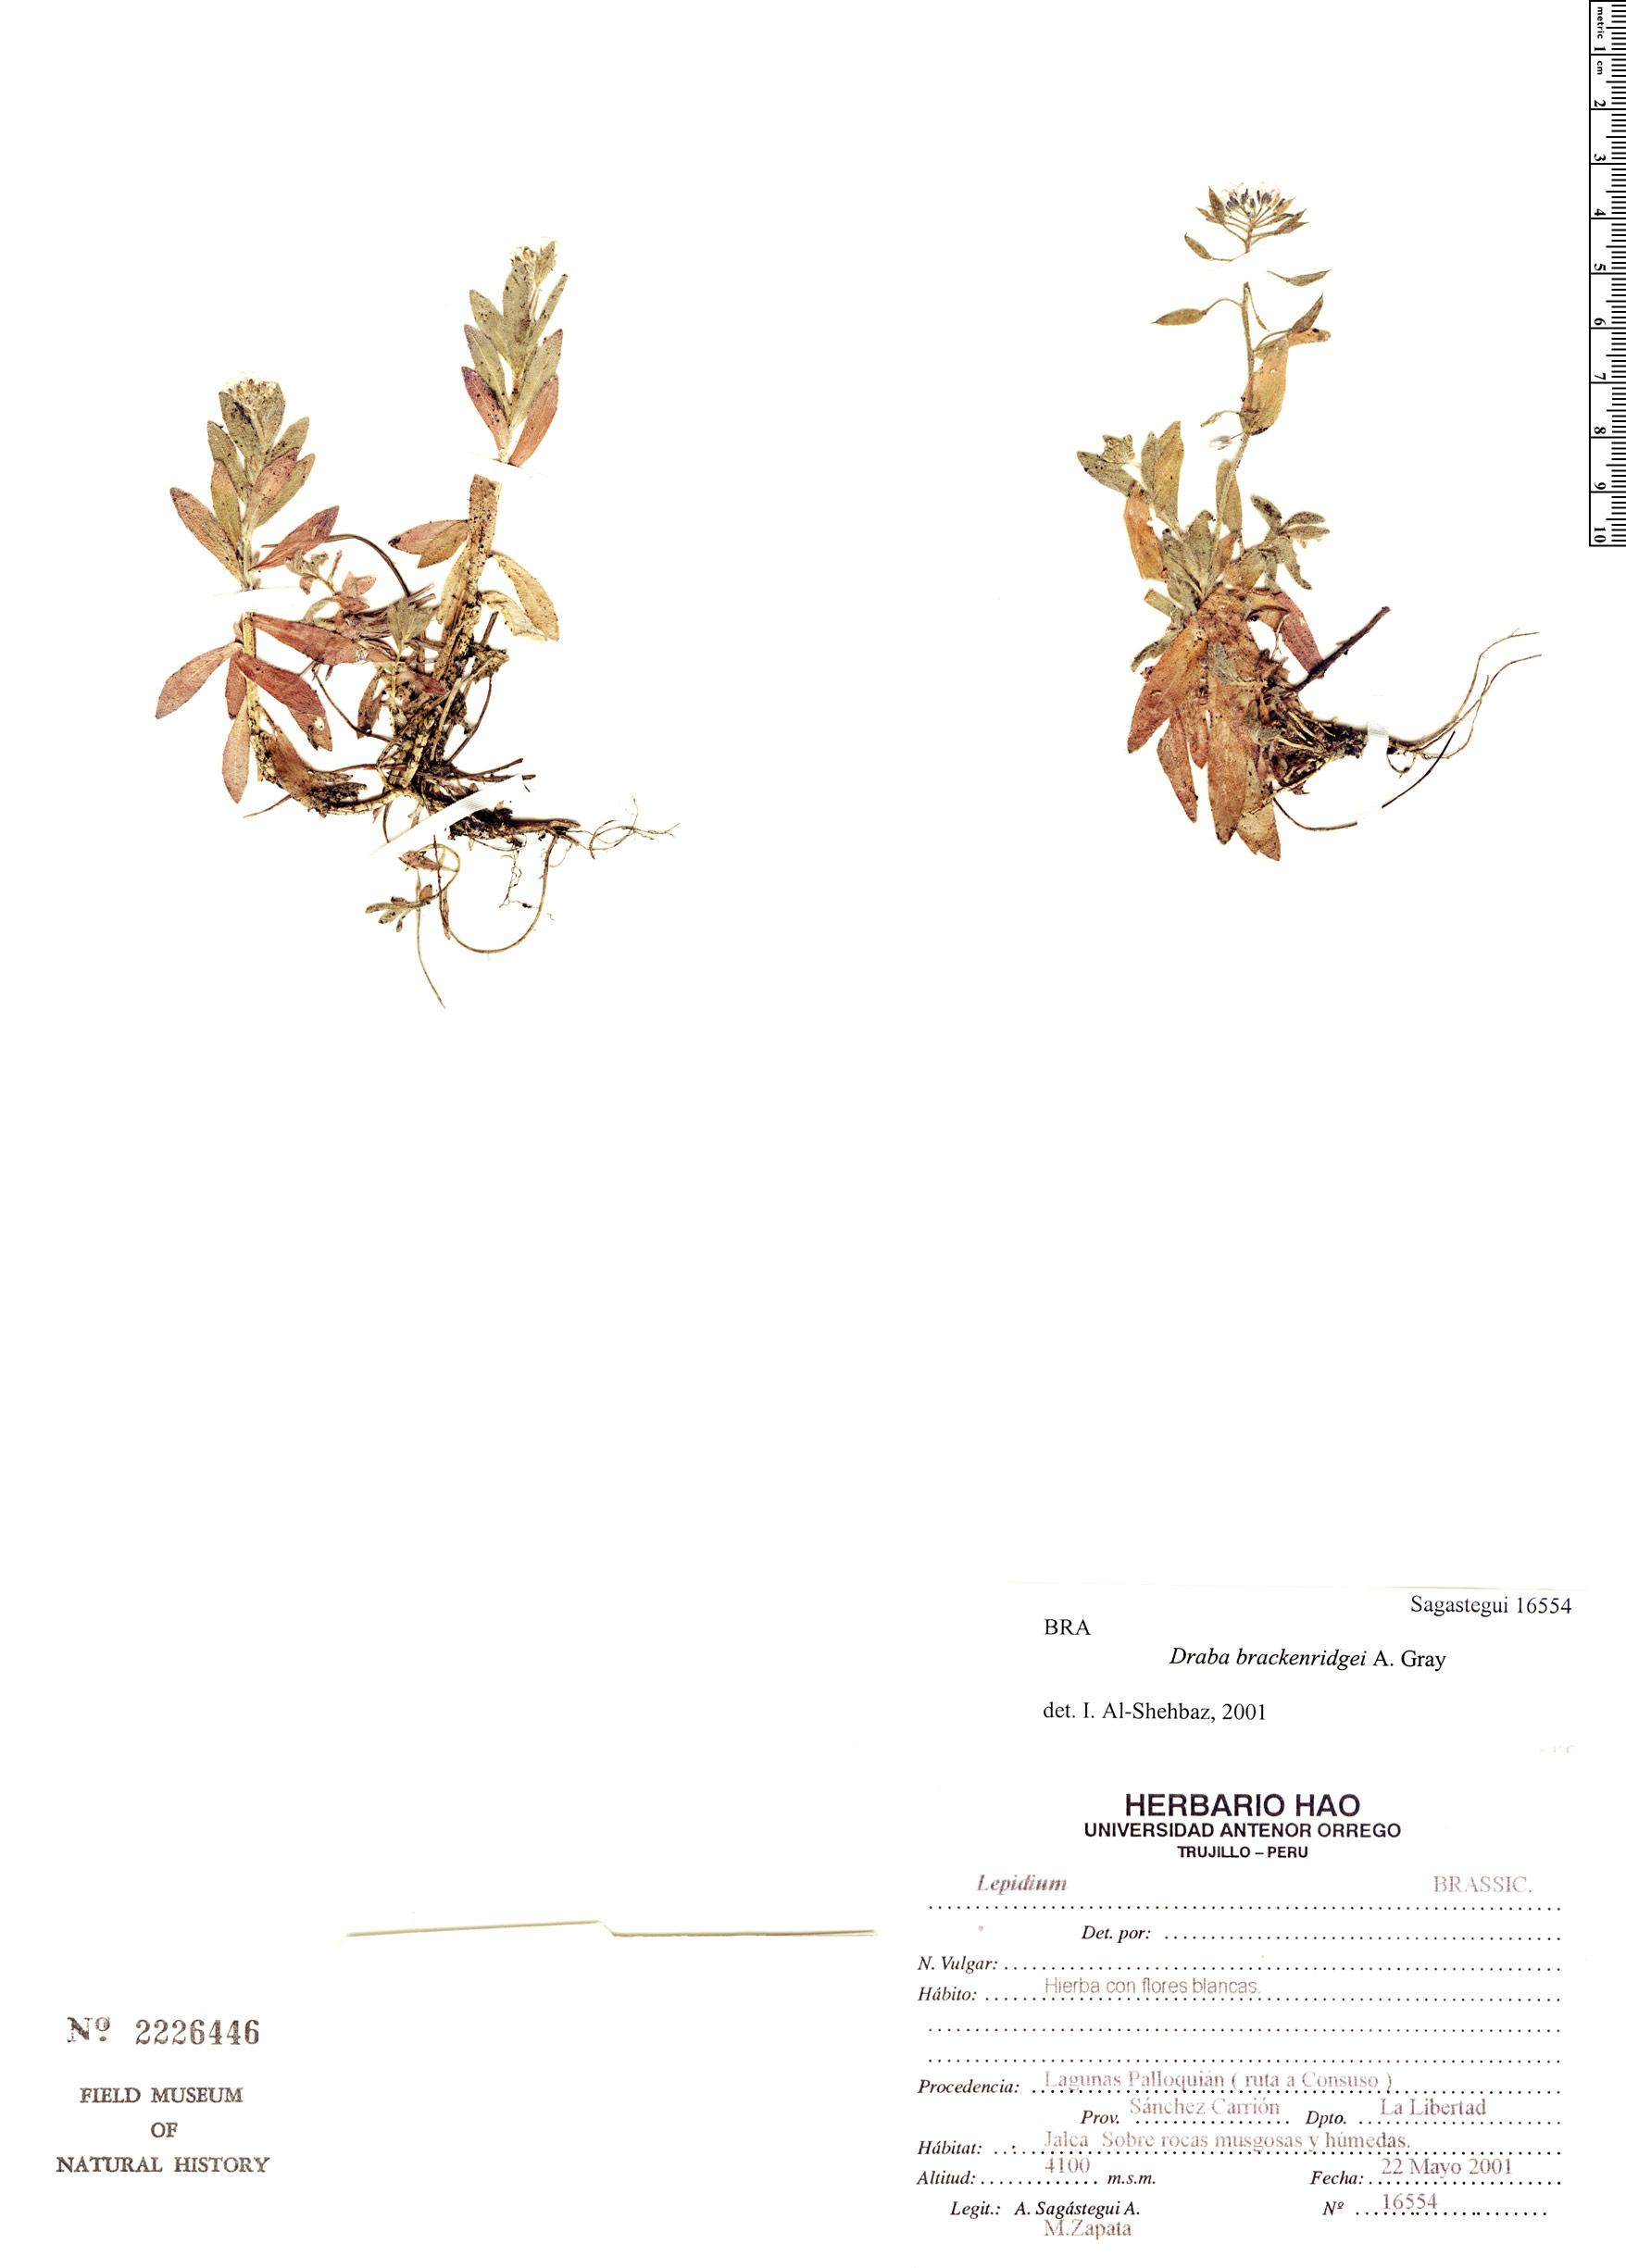 Specimen: Draba brackenridgei